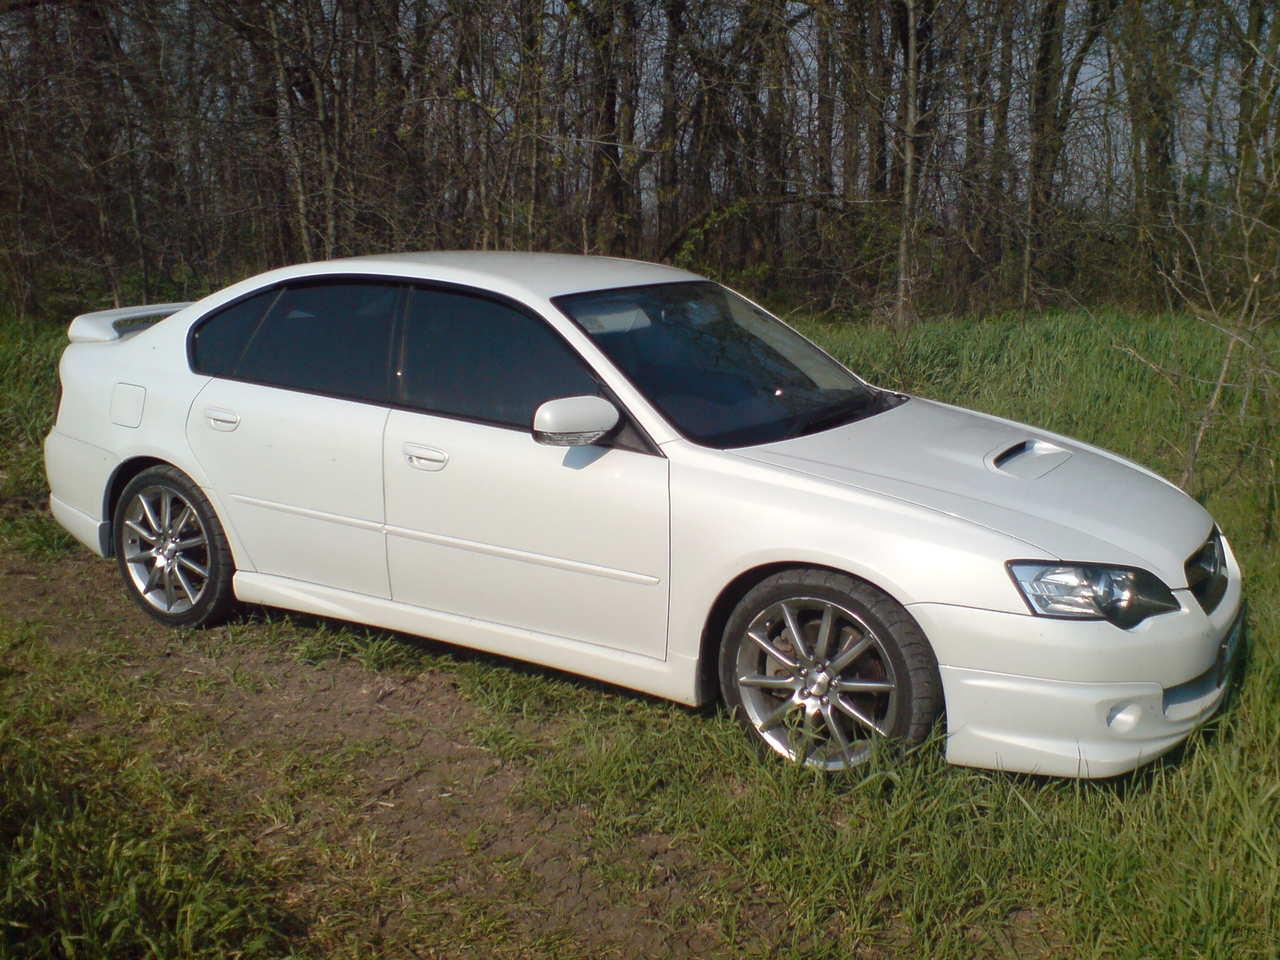 2004 Subaru Legacy B4 Pictures, 2.0l., Gasoline, Automatic For Sale